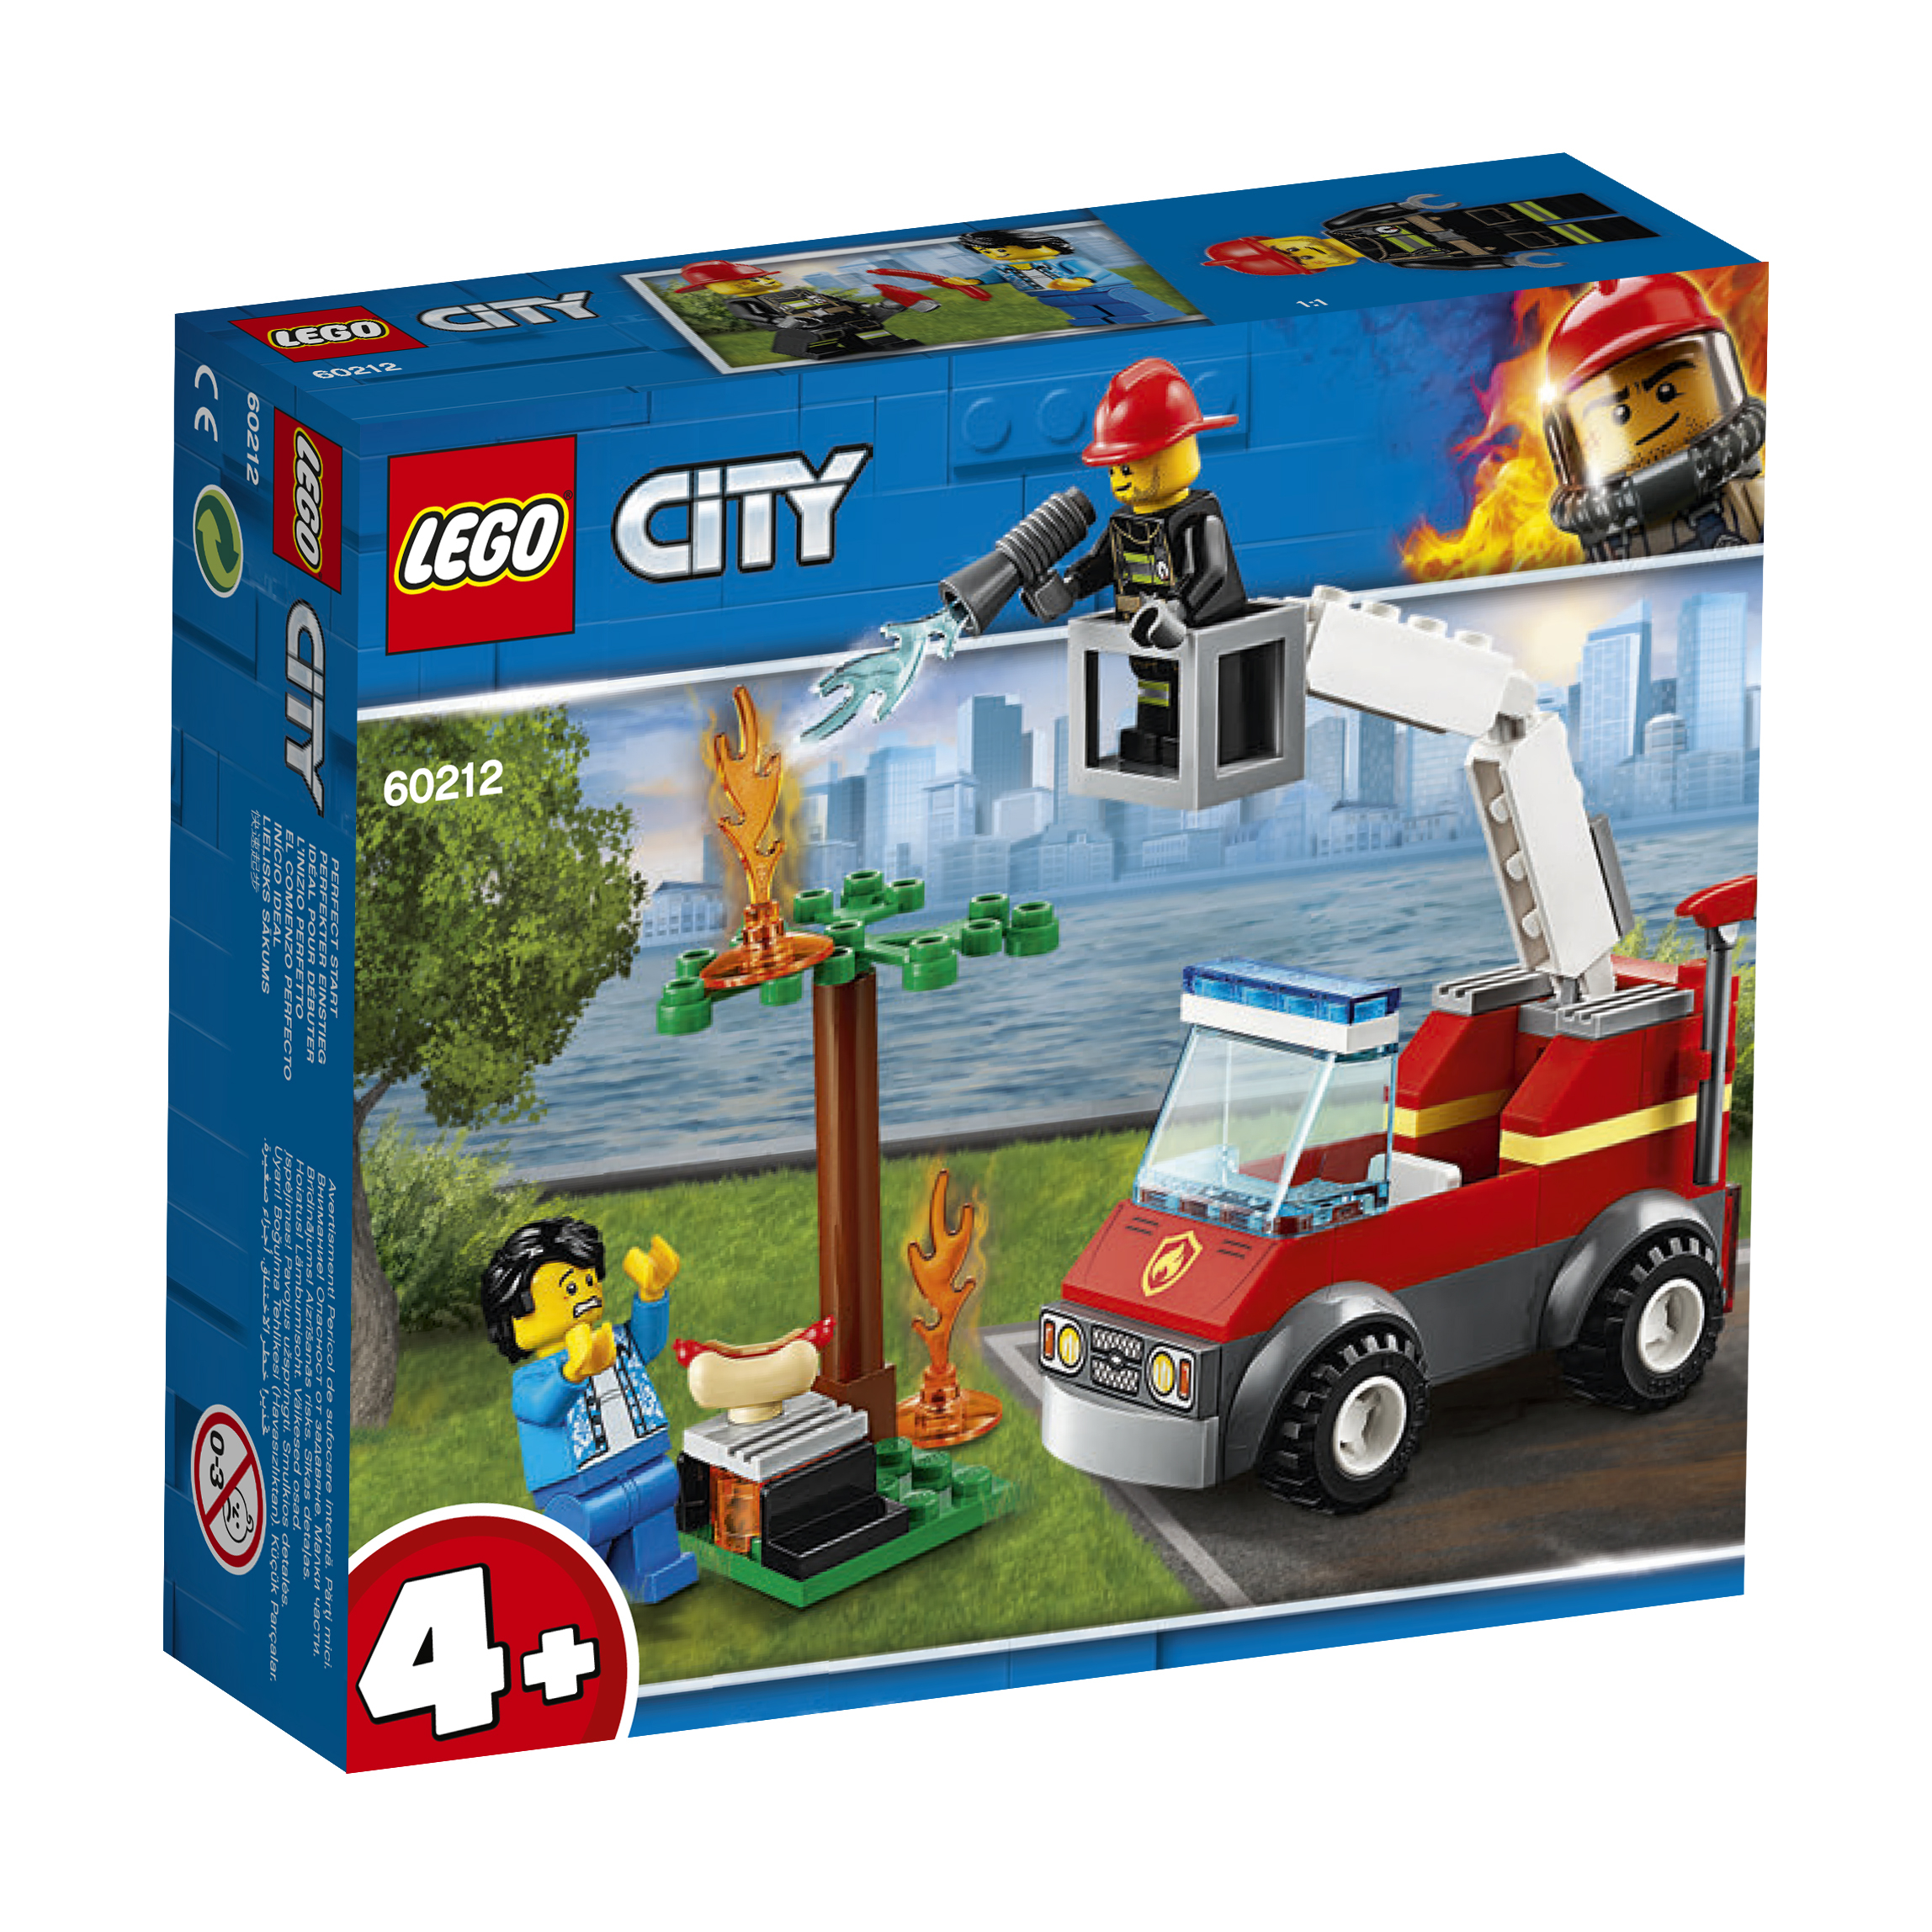 LEGO LEGO Fire 60212 Пожар на пикнике model building kits compatible with lego city fire car 586 3d blocks educational model